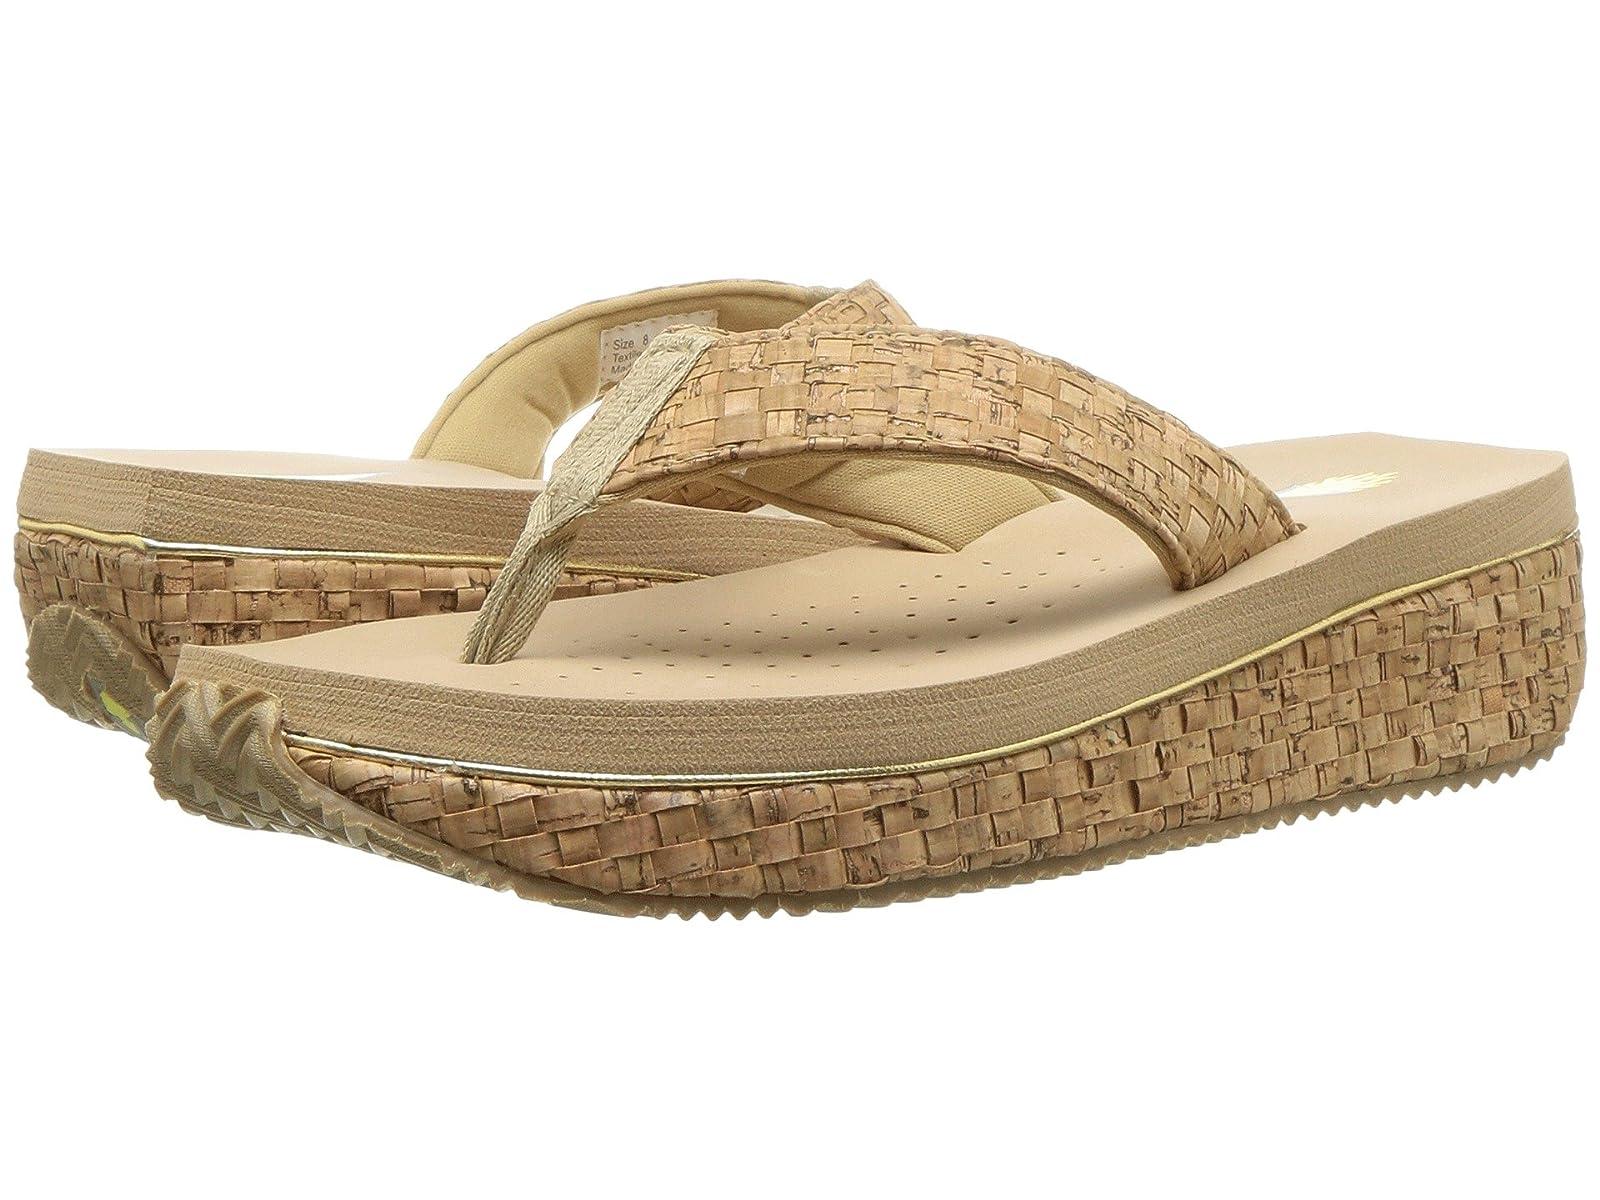 VOLATILE EdnesAtmospheric grades have affordable shoes